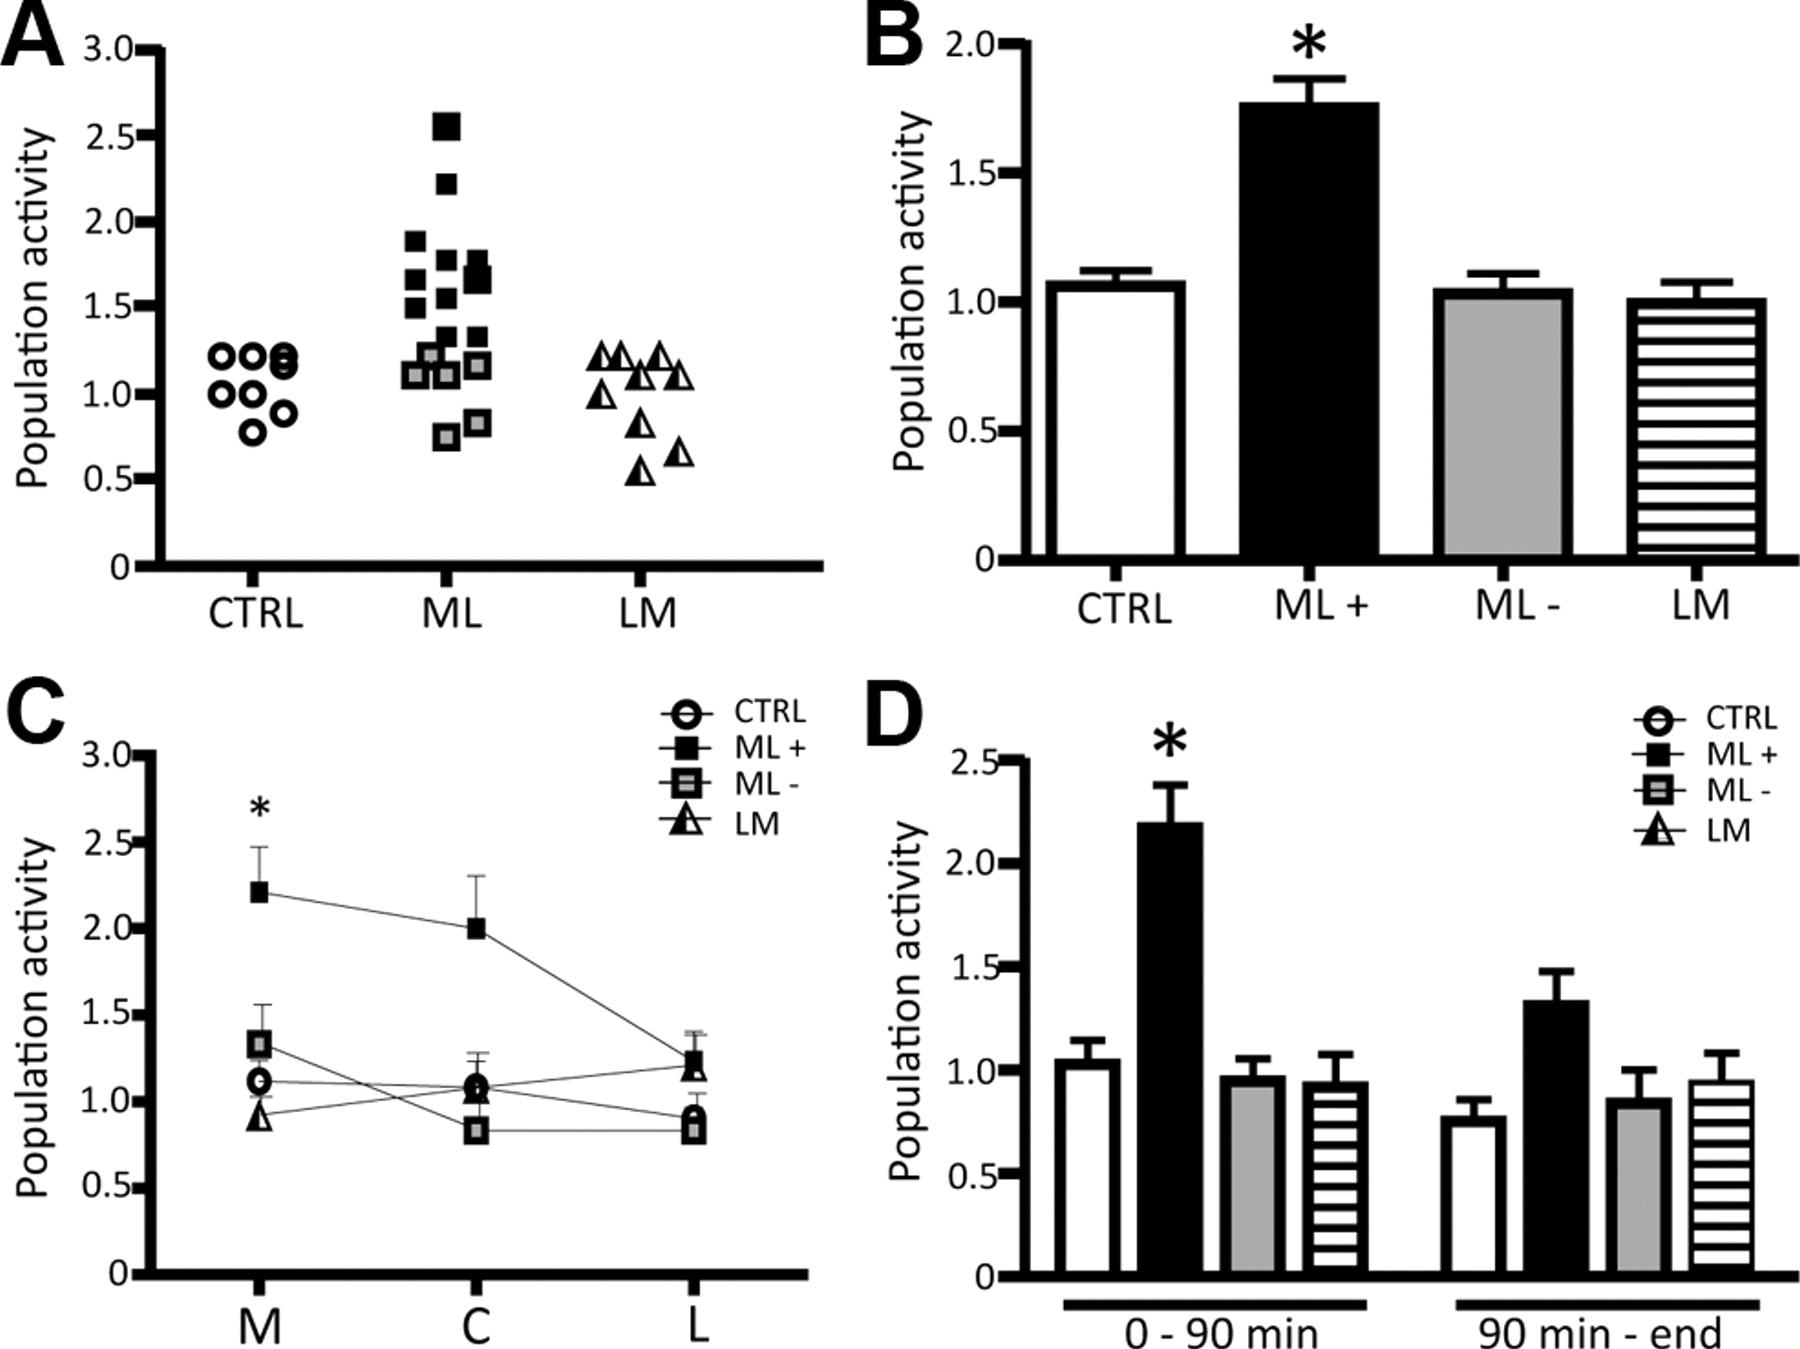 Aversive stimuli alter ventral tegmental area dopamine neuron download figure ccuart Image collections